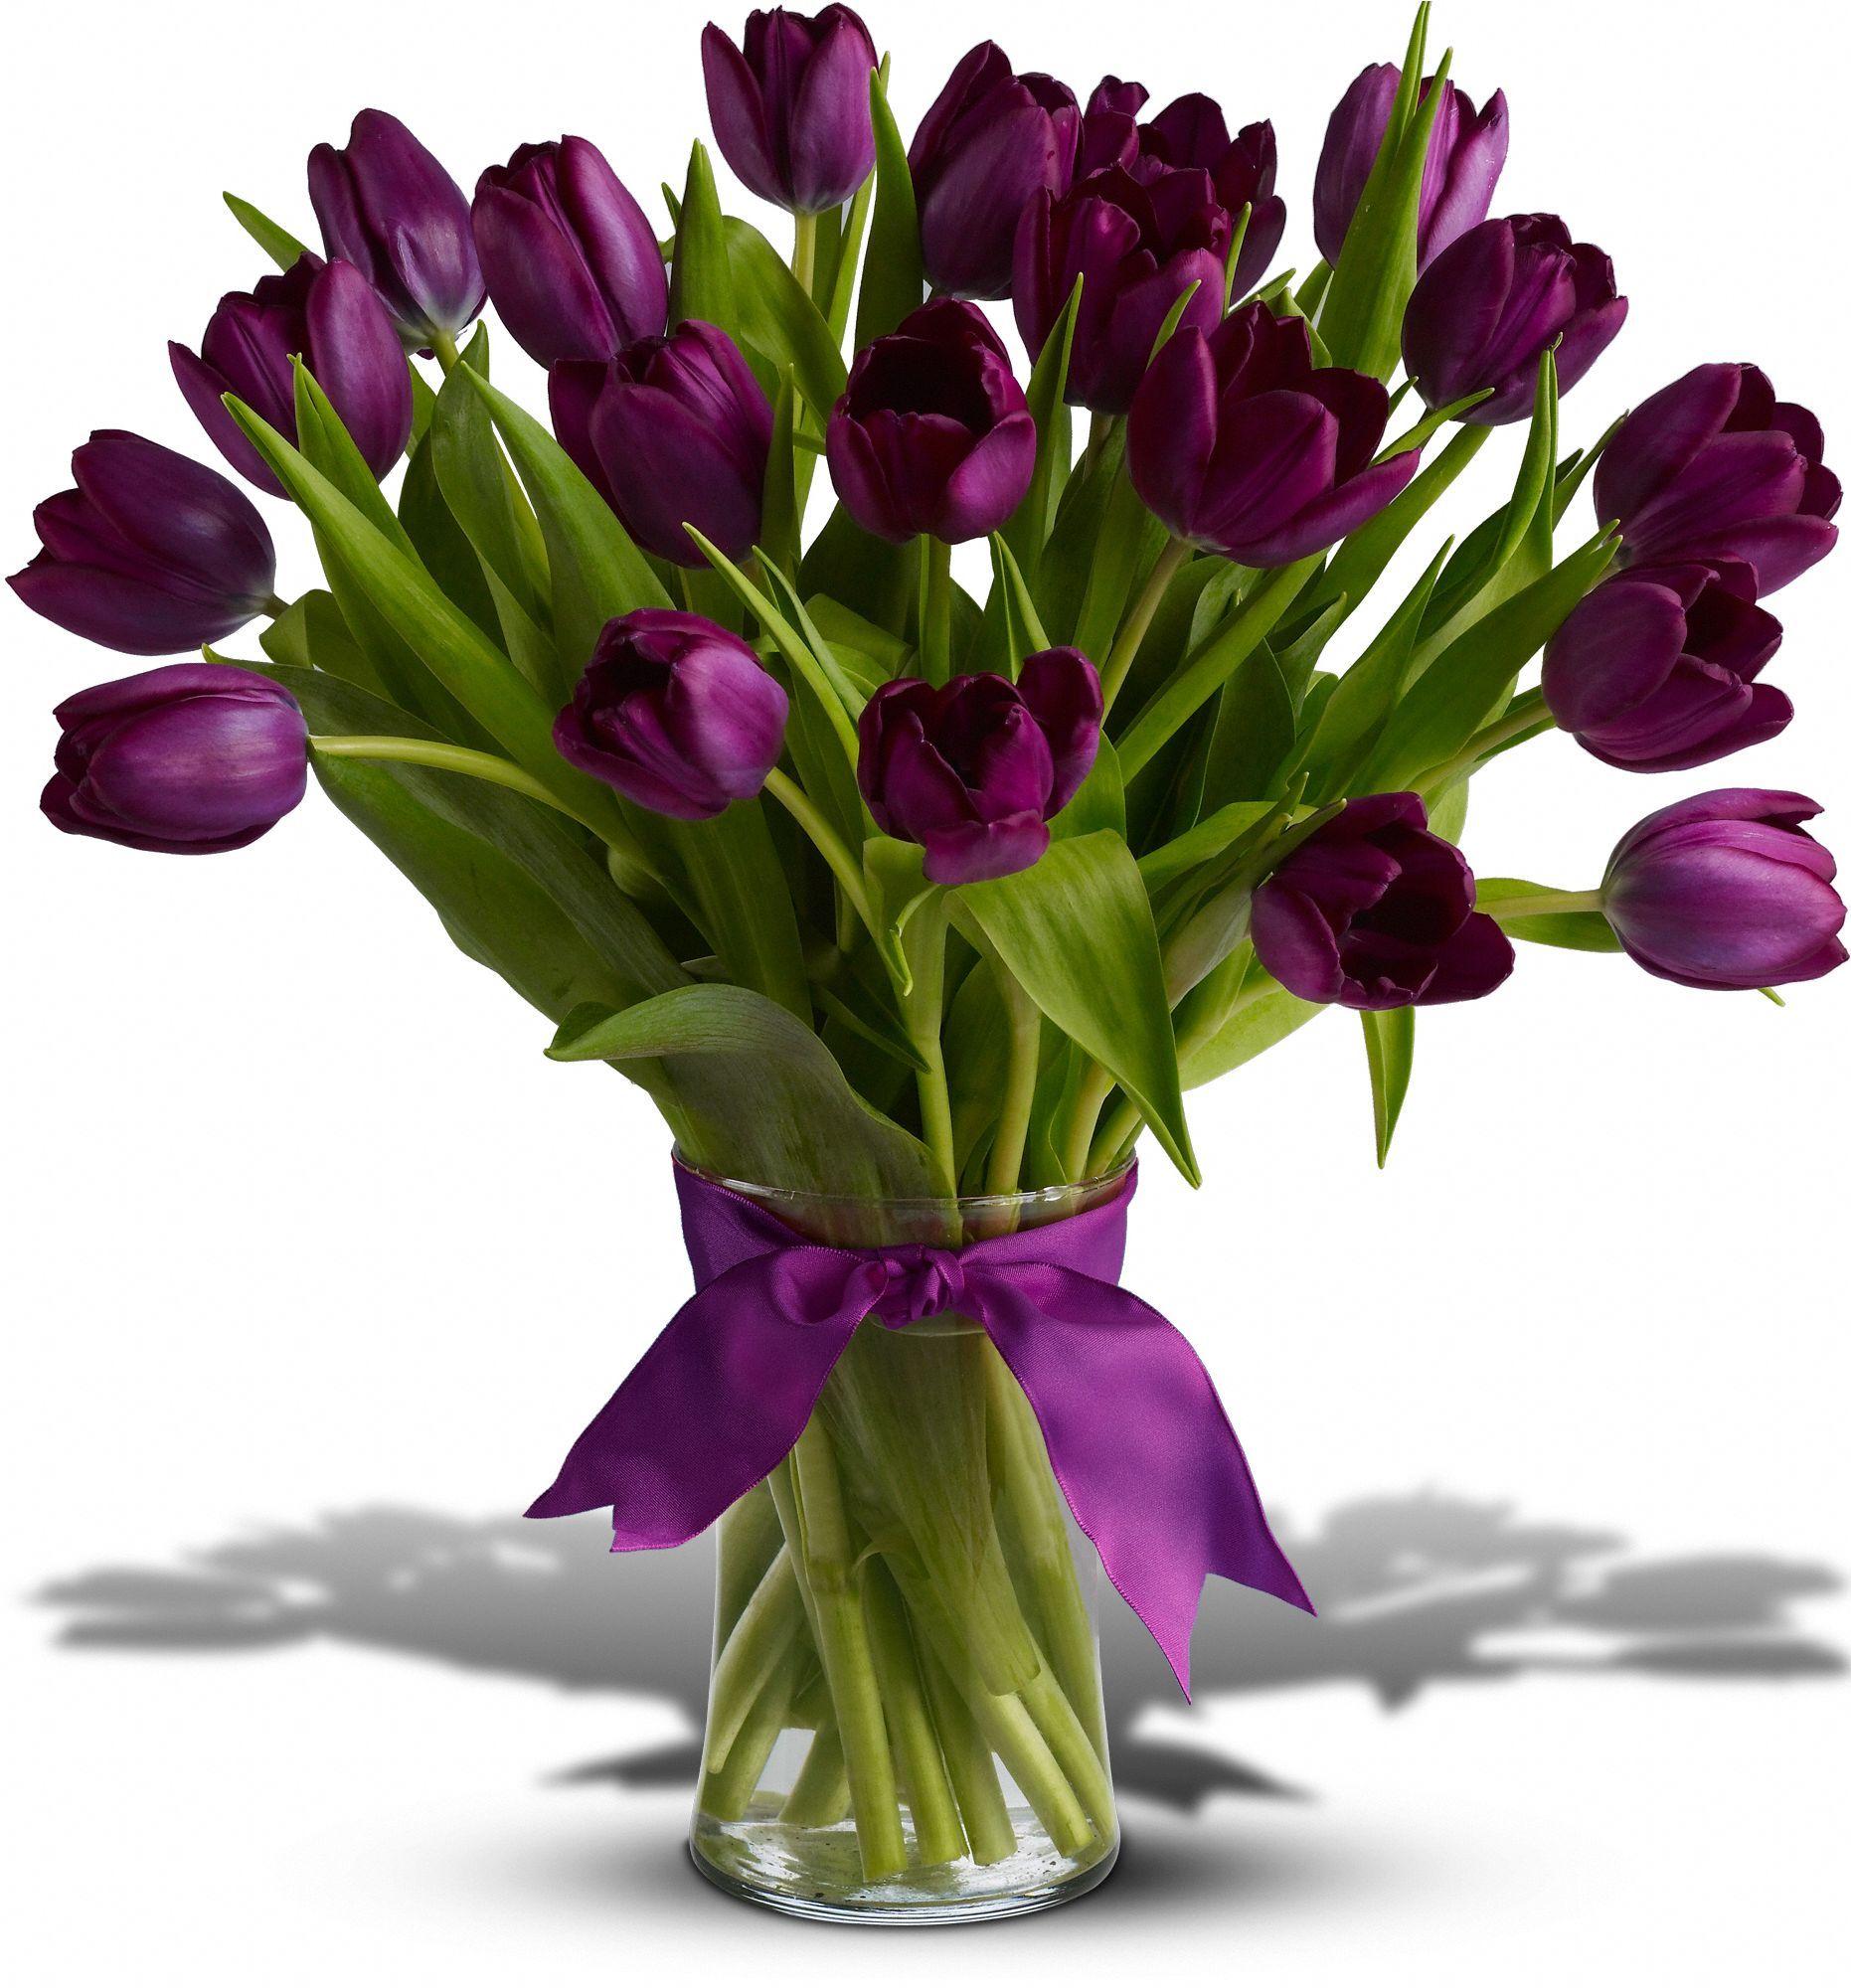 Favorite Flower In My Favorite Color Sweetness Tulips Arrangement Tulips Flowers Flower Arrangements